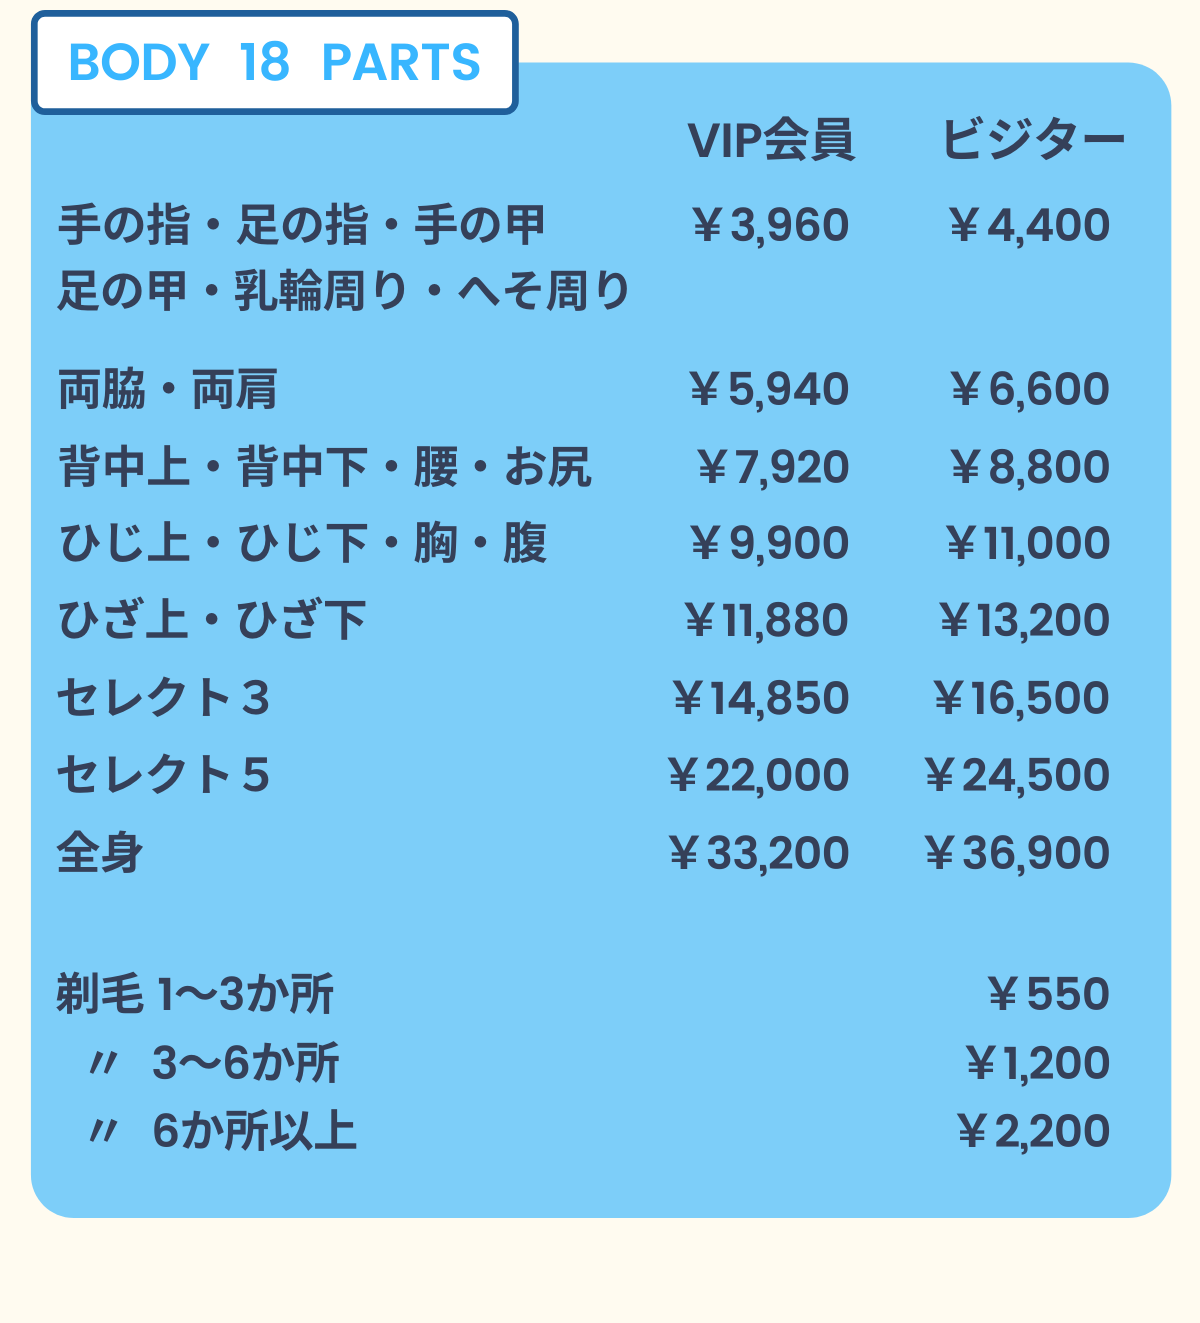 BODY18PARTS(ボディ18パーツ)「手の指、足の指、手の甲、足の甲、乳輪周り、へそ周り / VIP会員:¥3,960 ビジター:¥4,400」「両脇、両肩 / VIP会員:¥5,940 ビジター:¥6,600」「背中上、背中下、腰、お尻 / VIP会員:¥7,920 ビジター:¥8,800」「ひじ上、ひじ下、胸、腹 / VIP会員:¥9,900 ビジター:¥11,000」「ひざ上、ひざ下 / VIP会員:¥11,880 ビジター:¥13,200」「セレクト3 / VIP会員:¥14,850 ビジター:¥16,500」「セレクト5 / VIP会員:¥22,000 ビジター:¥24,500」「全身 / VIP会員:¥33,200 ビジター:¥36,900」「剃毛 / 1~3か所:¥550 3~6か所:¥1,200 6か所以上:¥2,200」